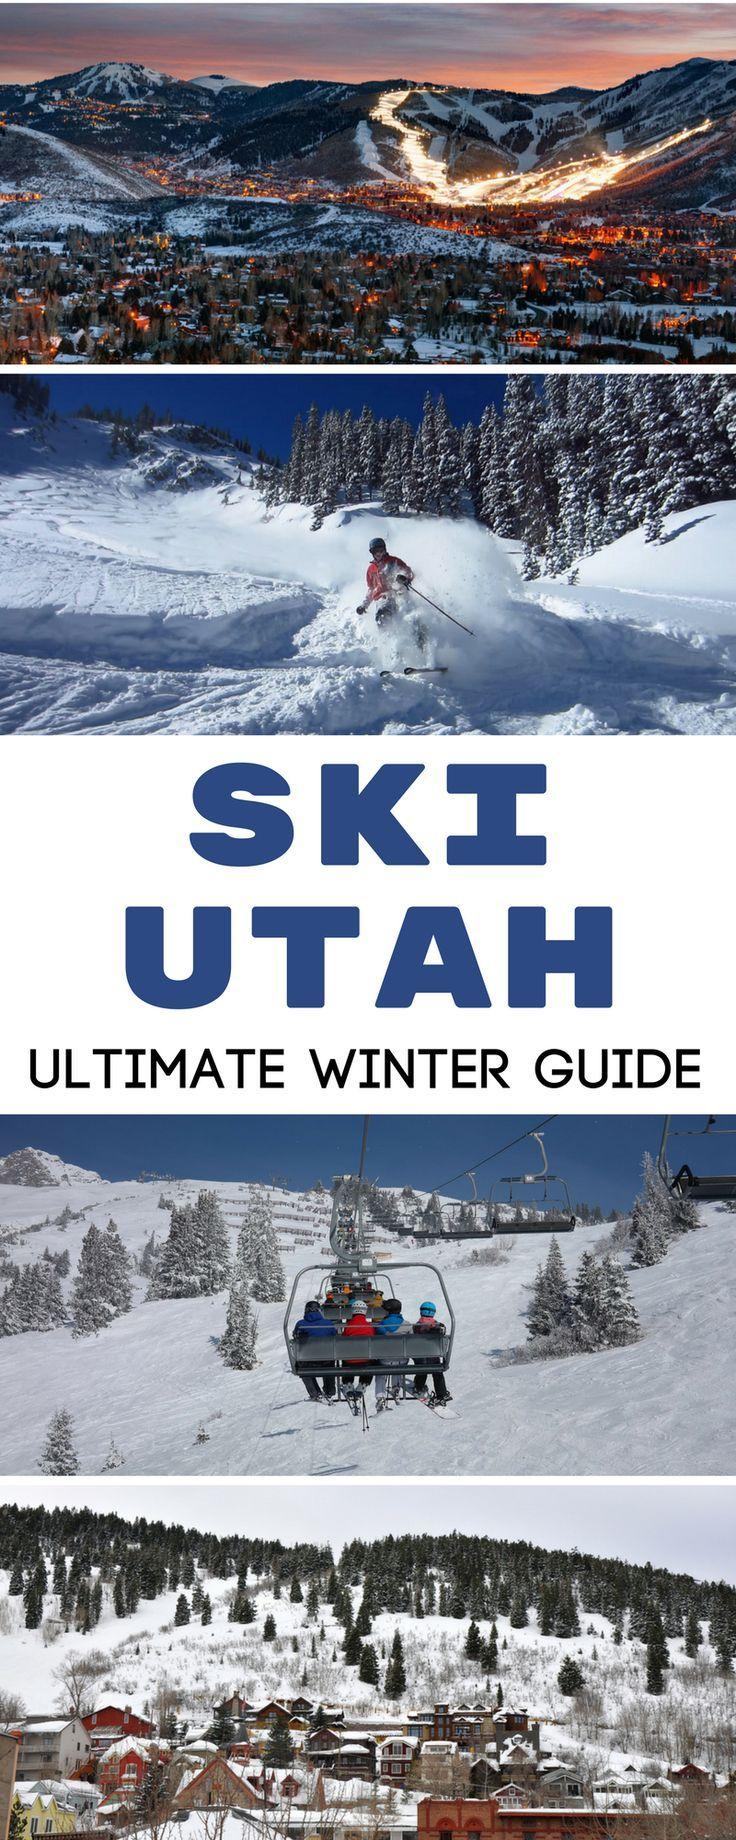 10 Reasons Why Utah Should Be On Your Family's Bucket List ... |Utah Ski Resorts List